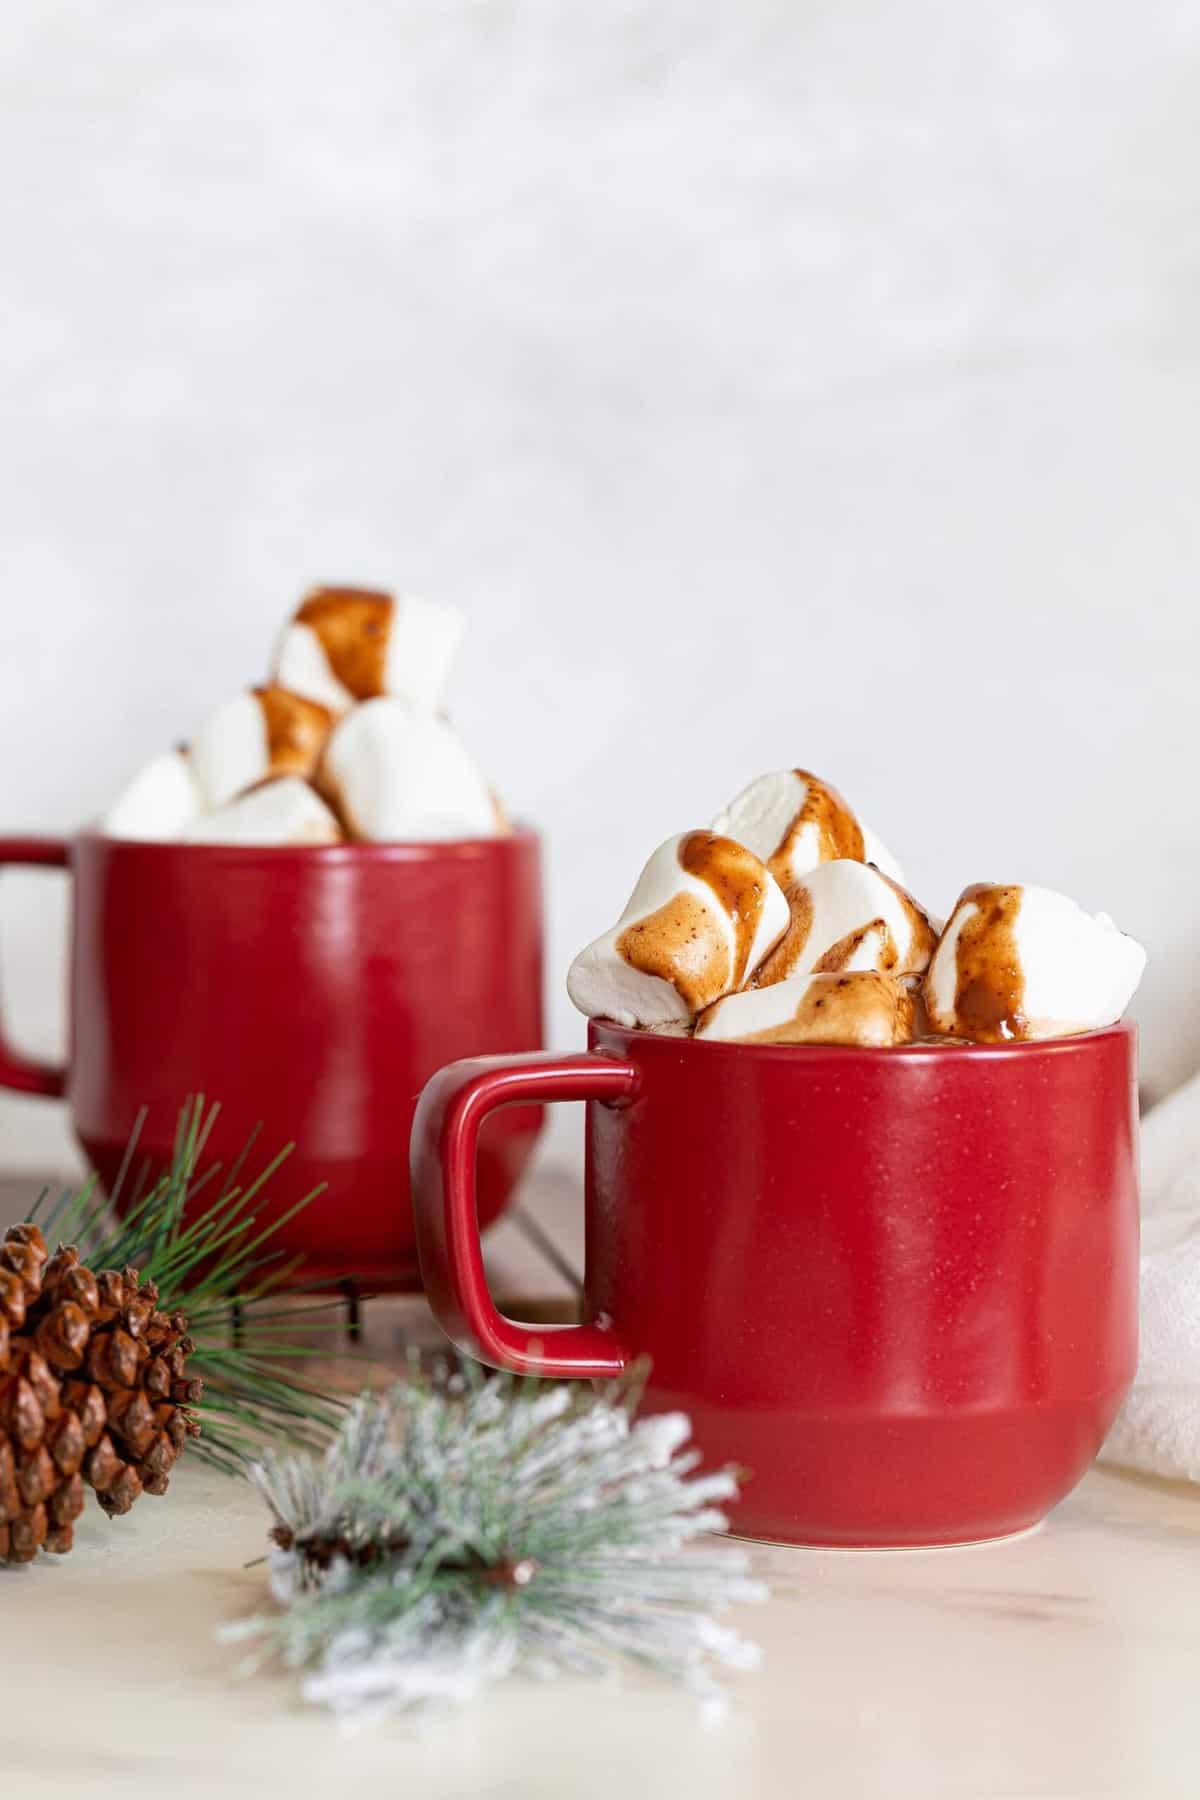 Creamy Homemade Caramel Hot Chocolate